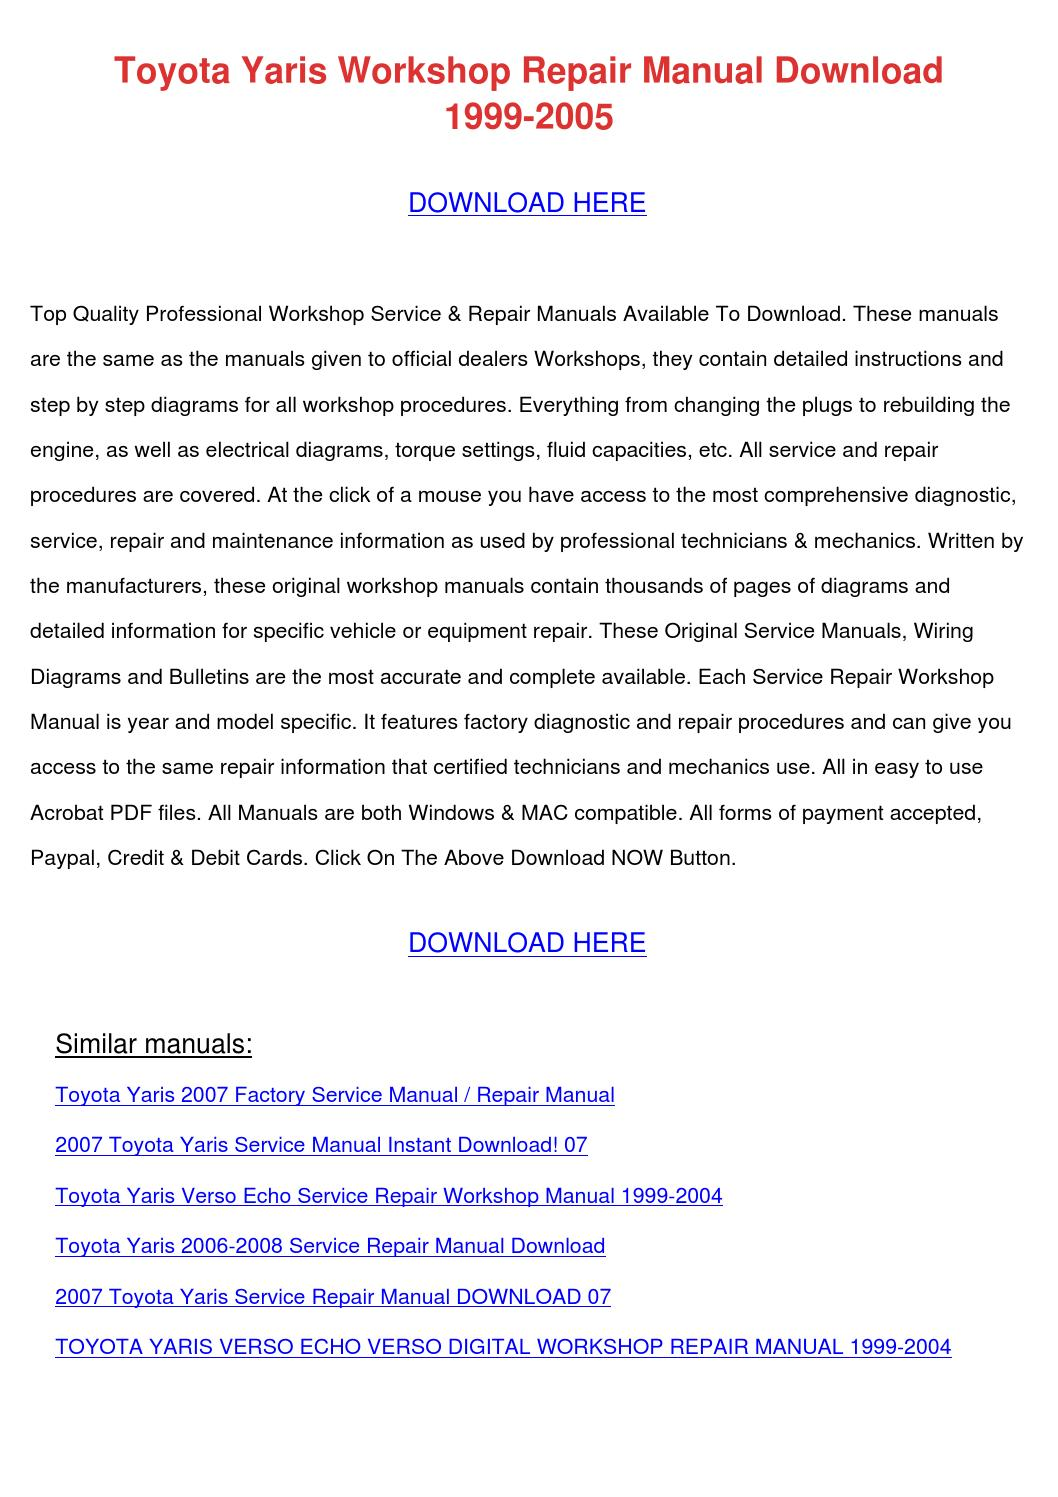 Toyota Yaris Workshop Repair Manual Download By Lisaleblanc Issuu Belta Wiring Diagram